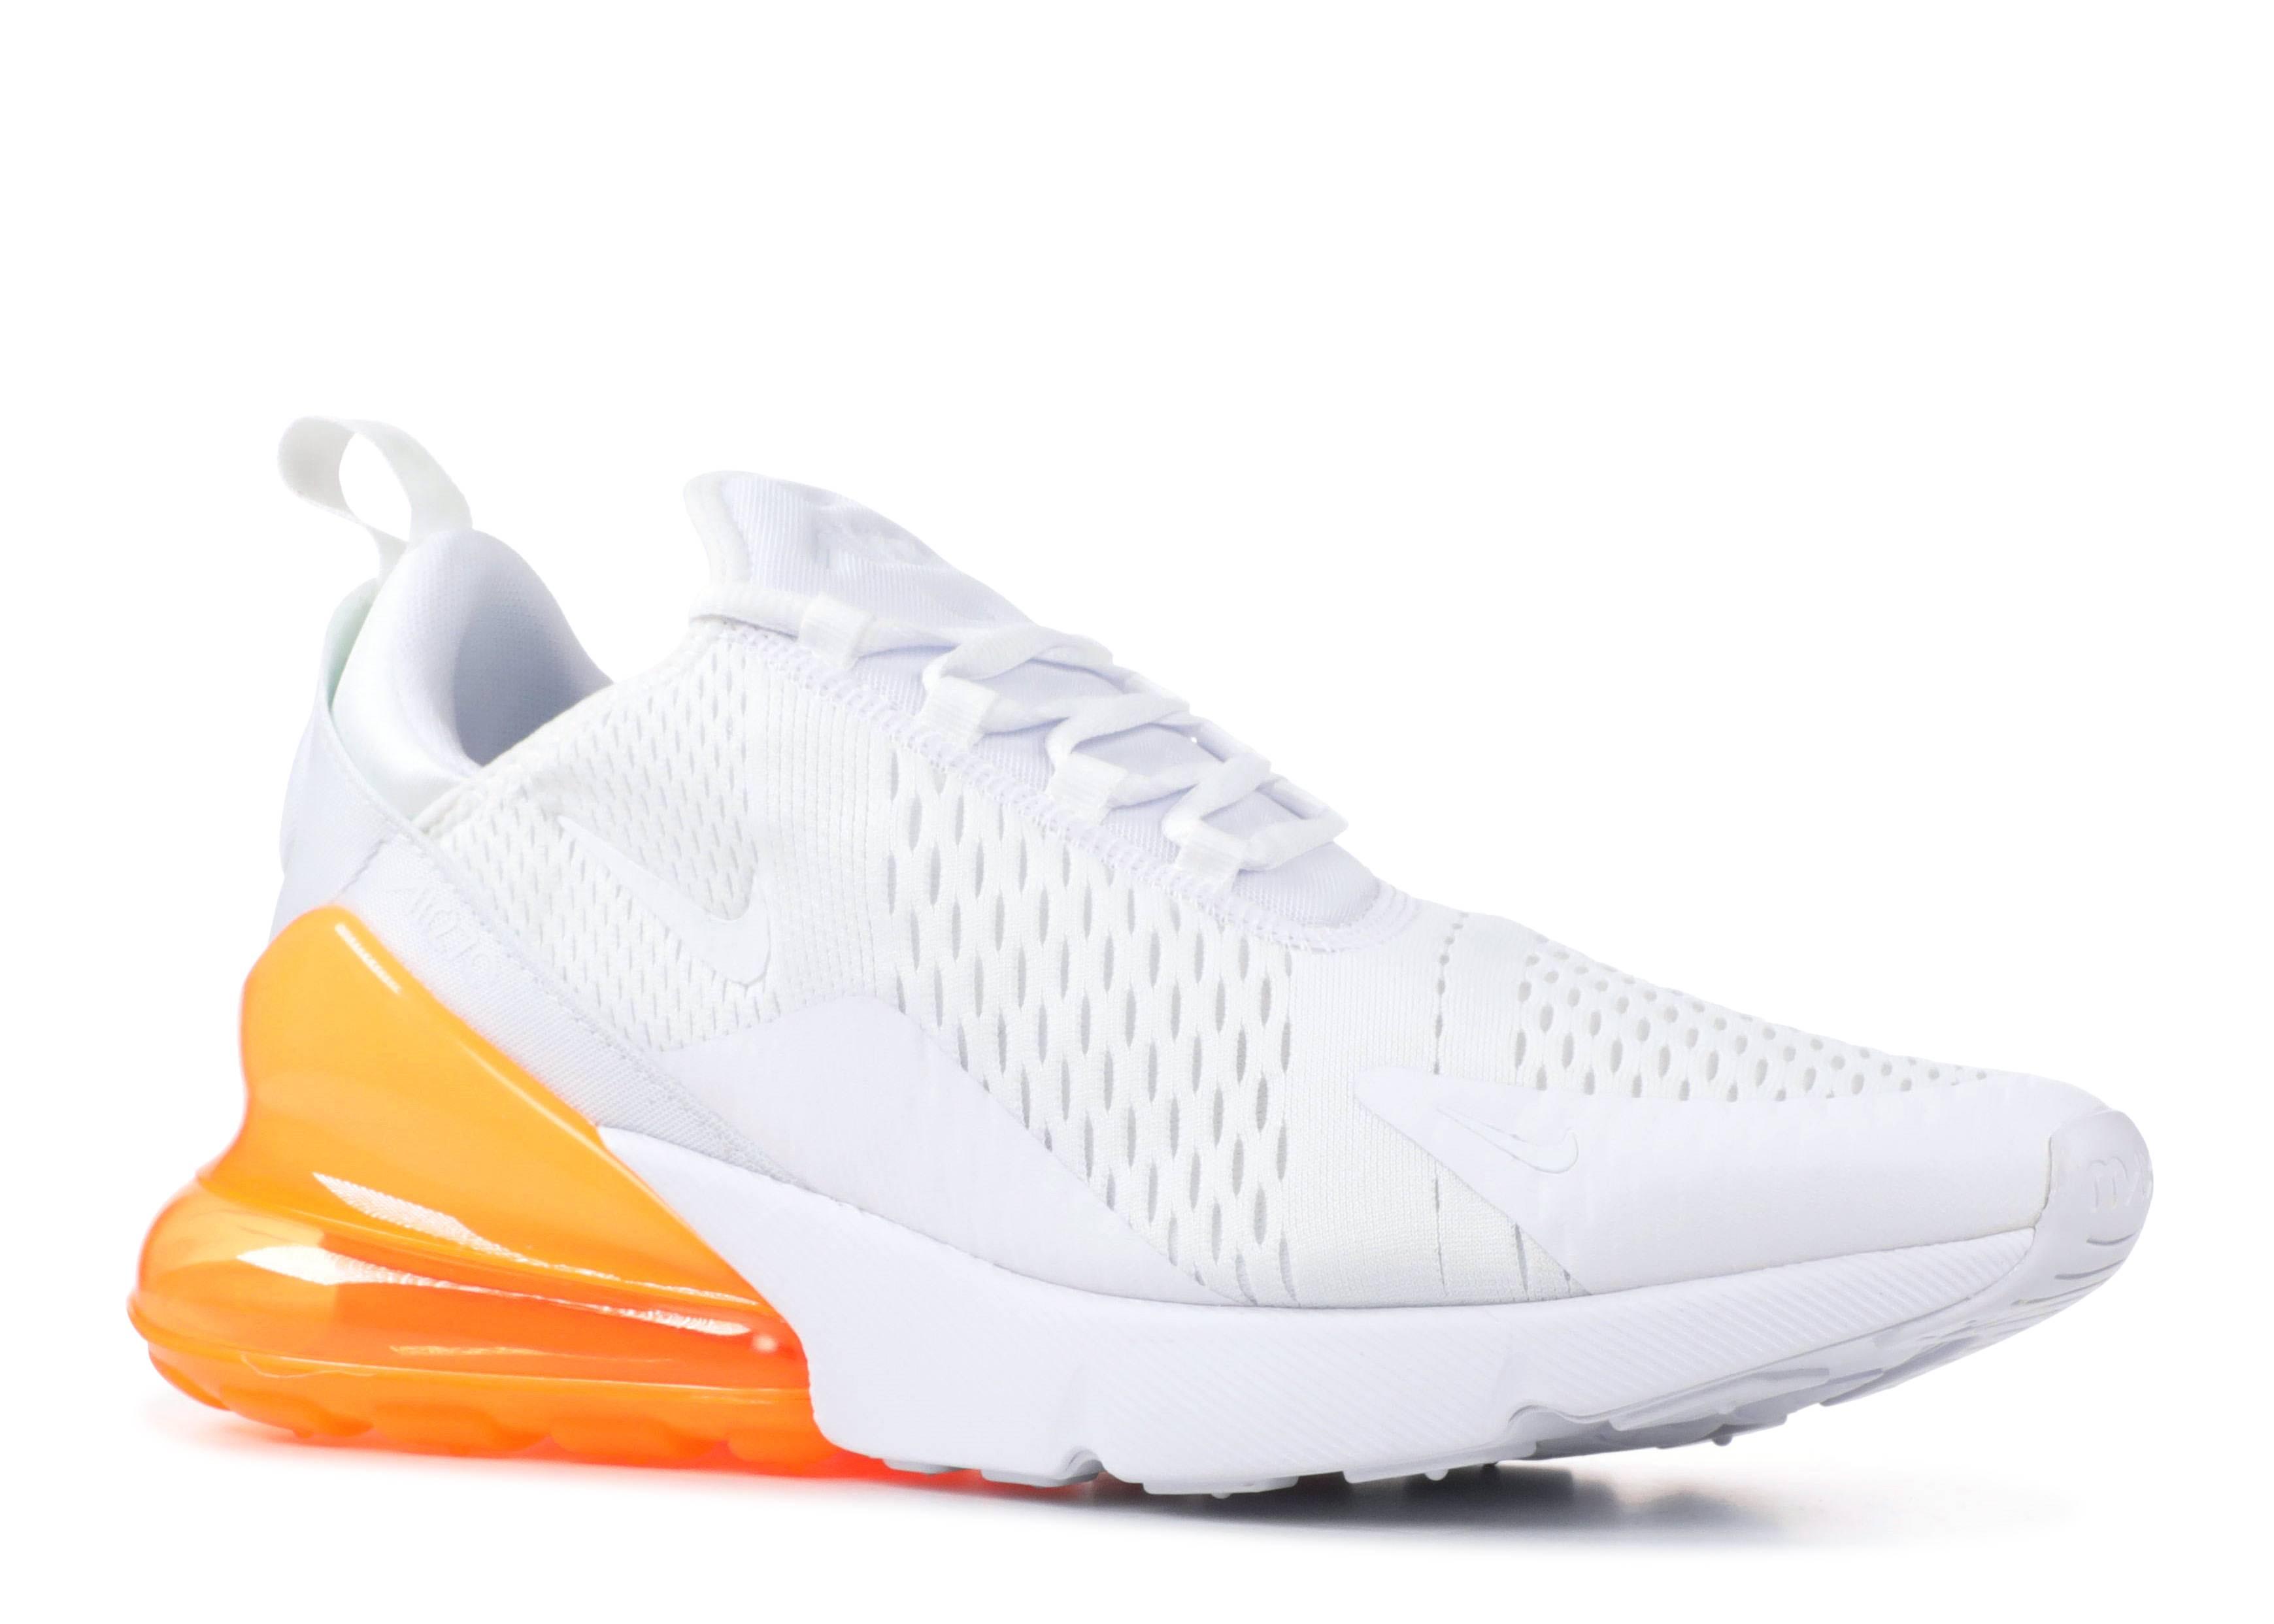 Air Max 270 - Nike - ah8050 102 - white/white-total orange | Flight Club